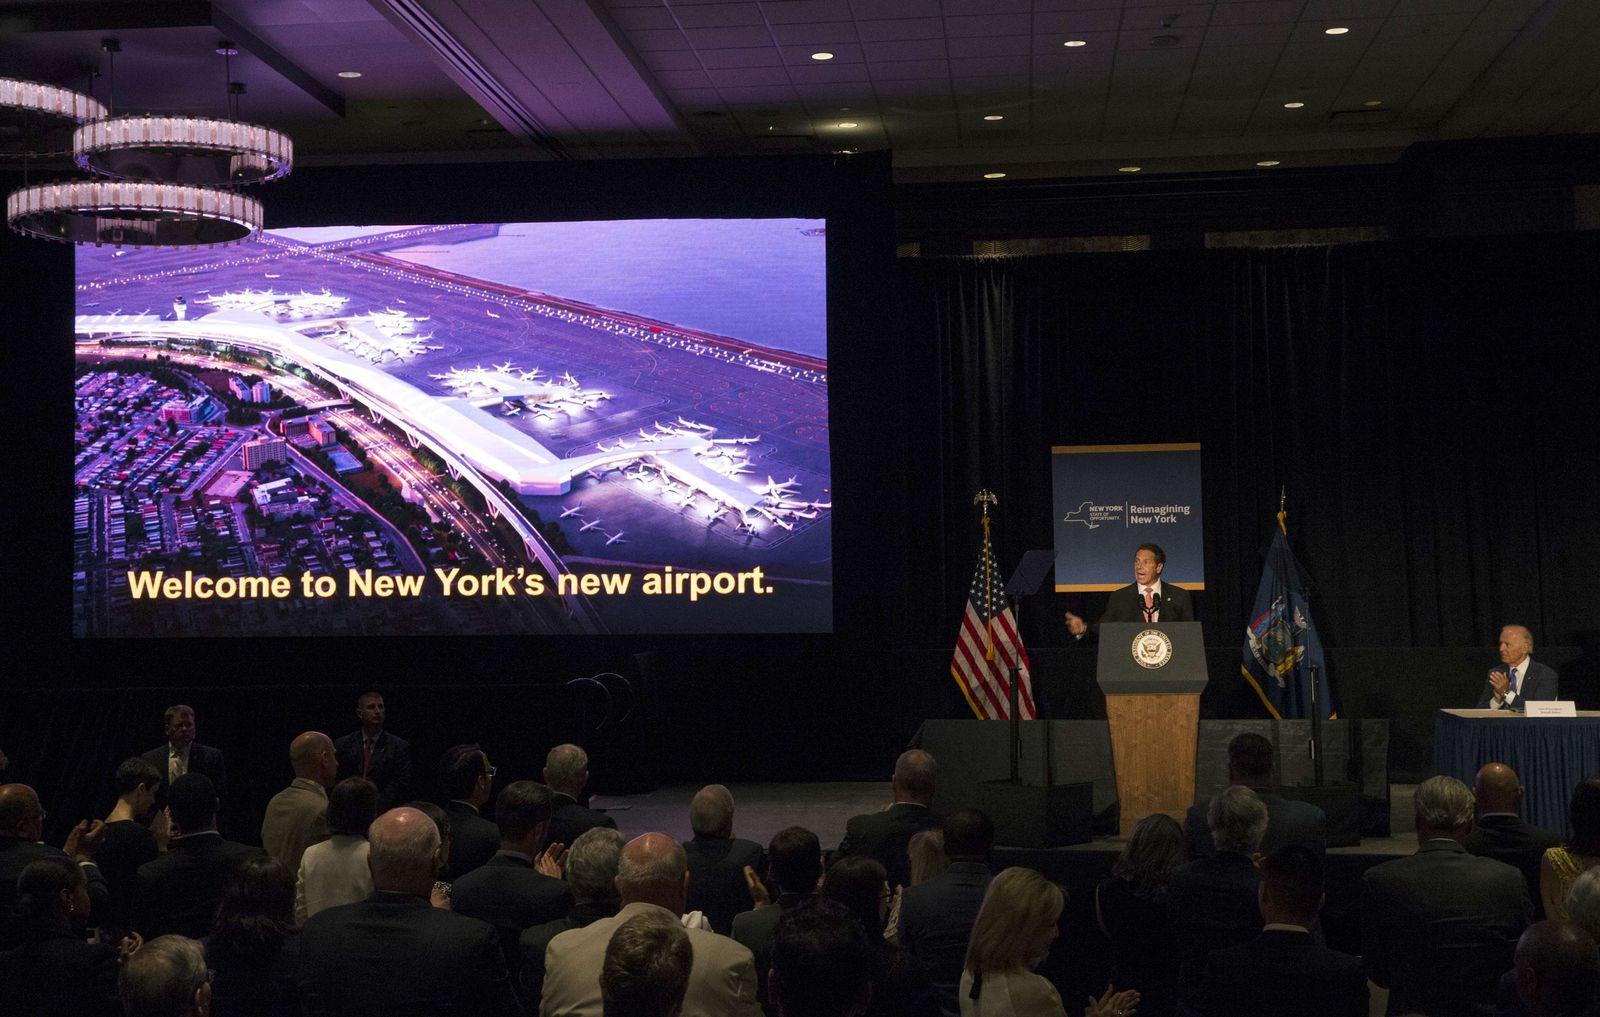 USA-NEW YORK/AIRPORT